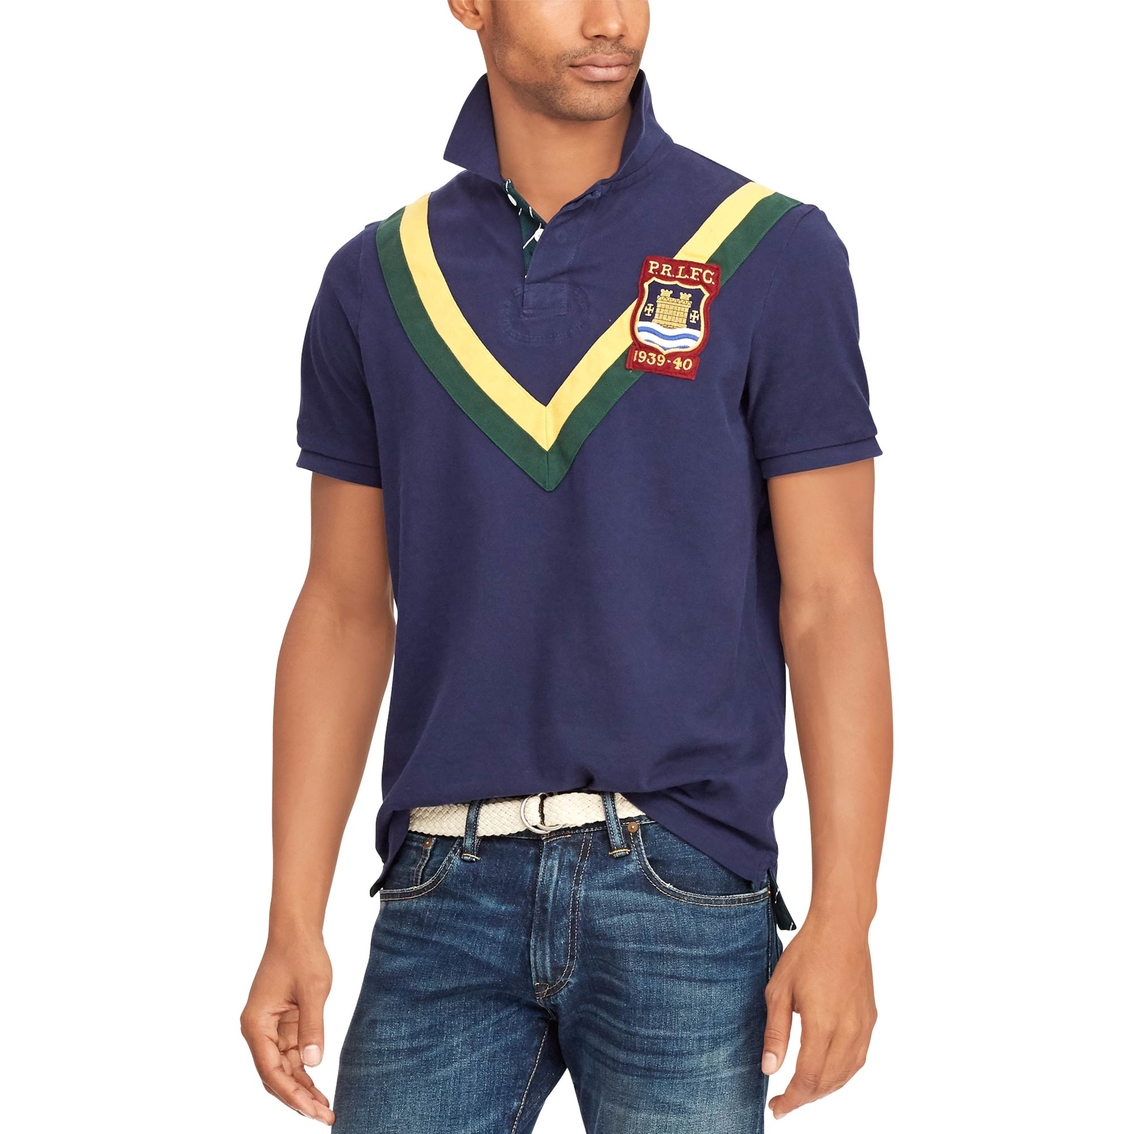 41377e3a Polo Ralph Lauren Classic Fit Mesh Polo Shirt | Polo Ralph Lauren ...